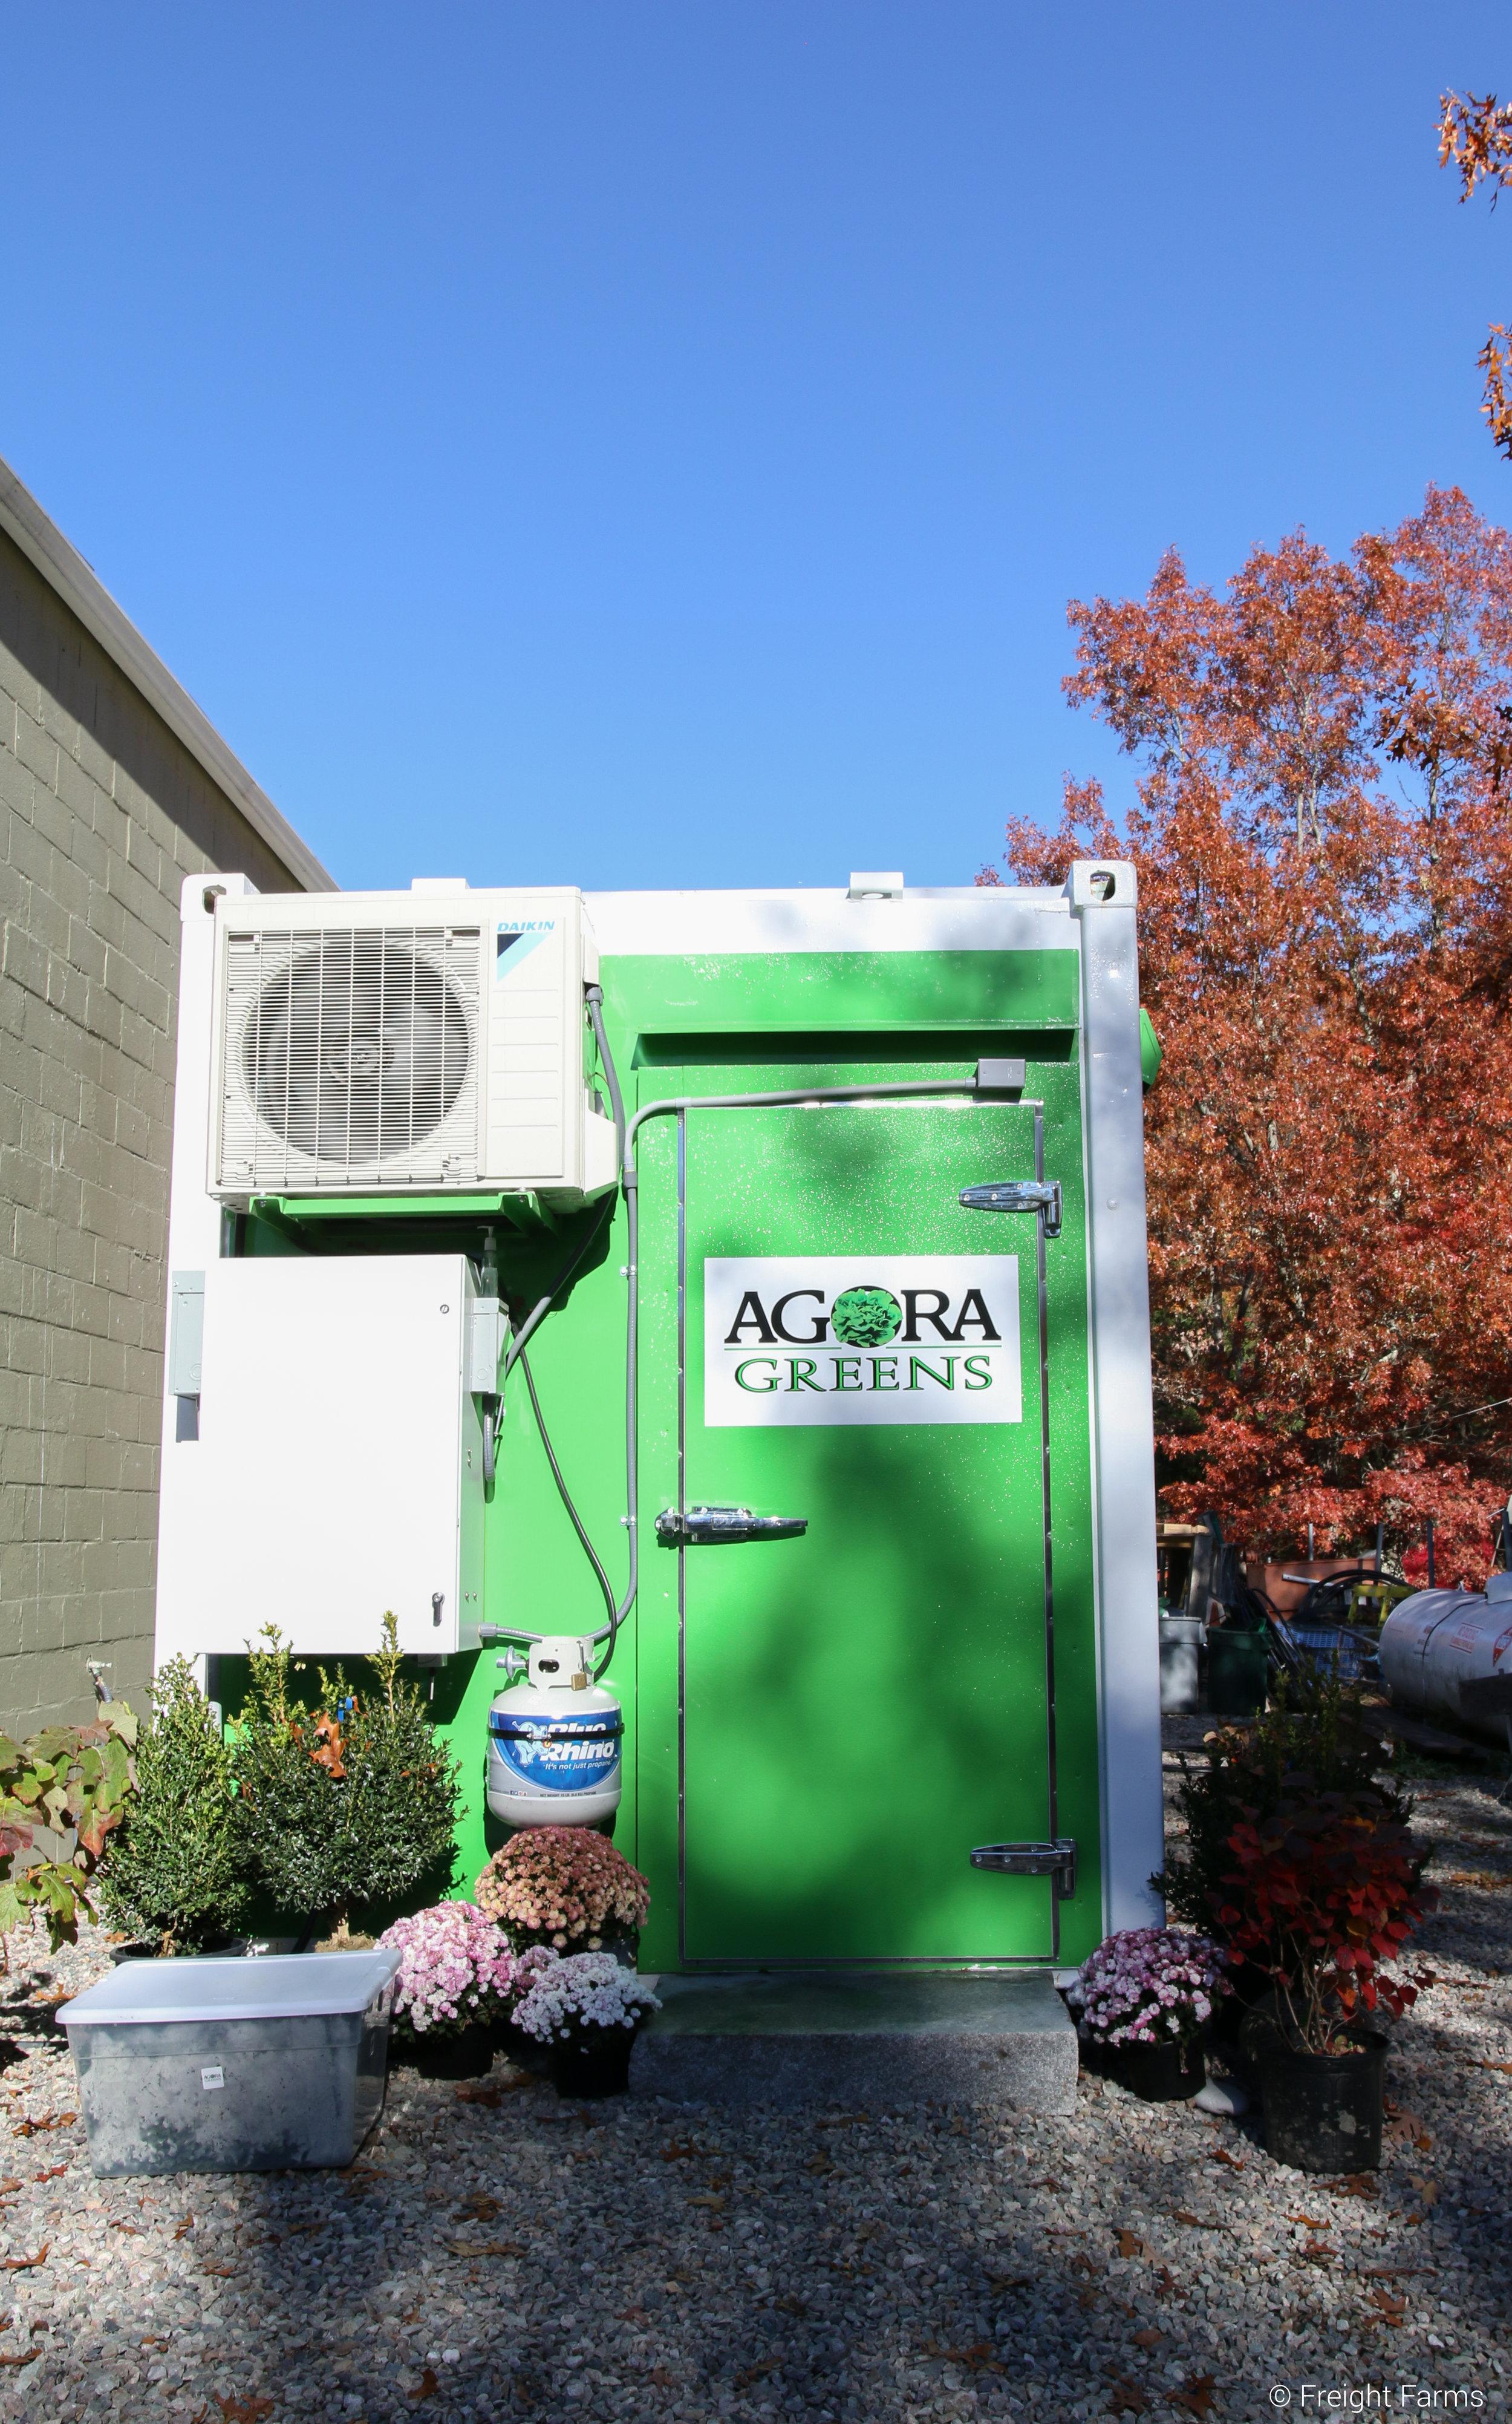 Agora Greens' Leafy Green Machine.